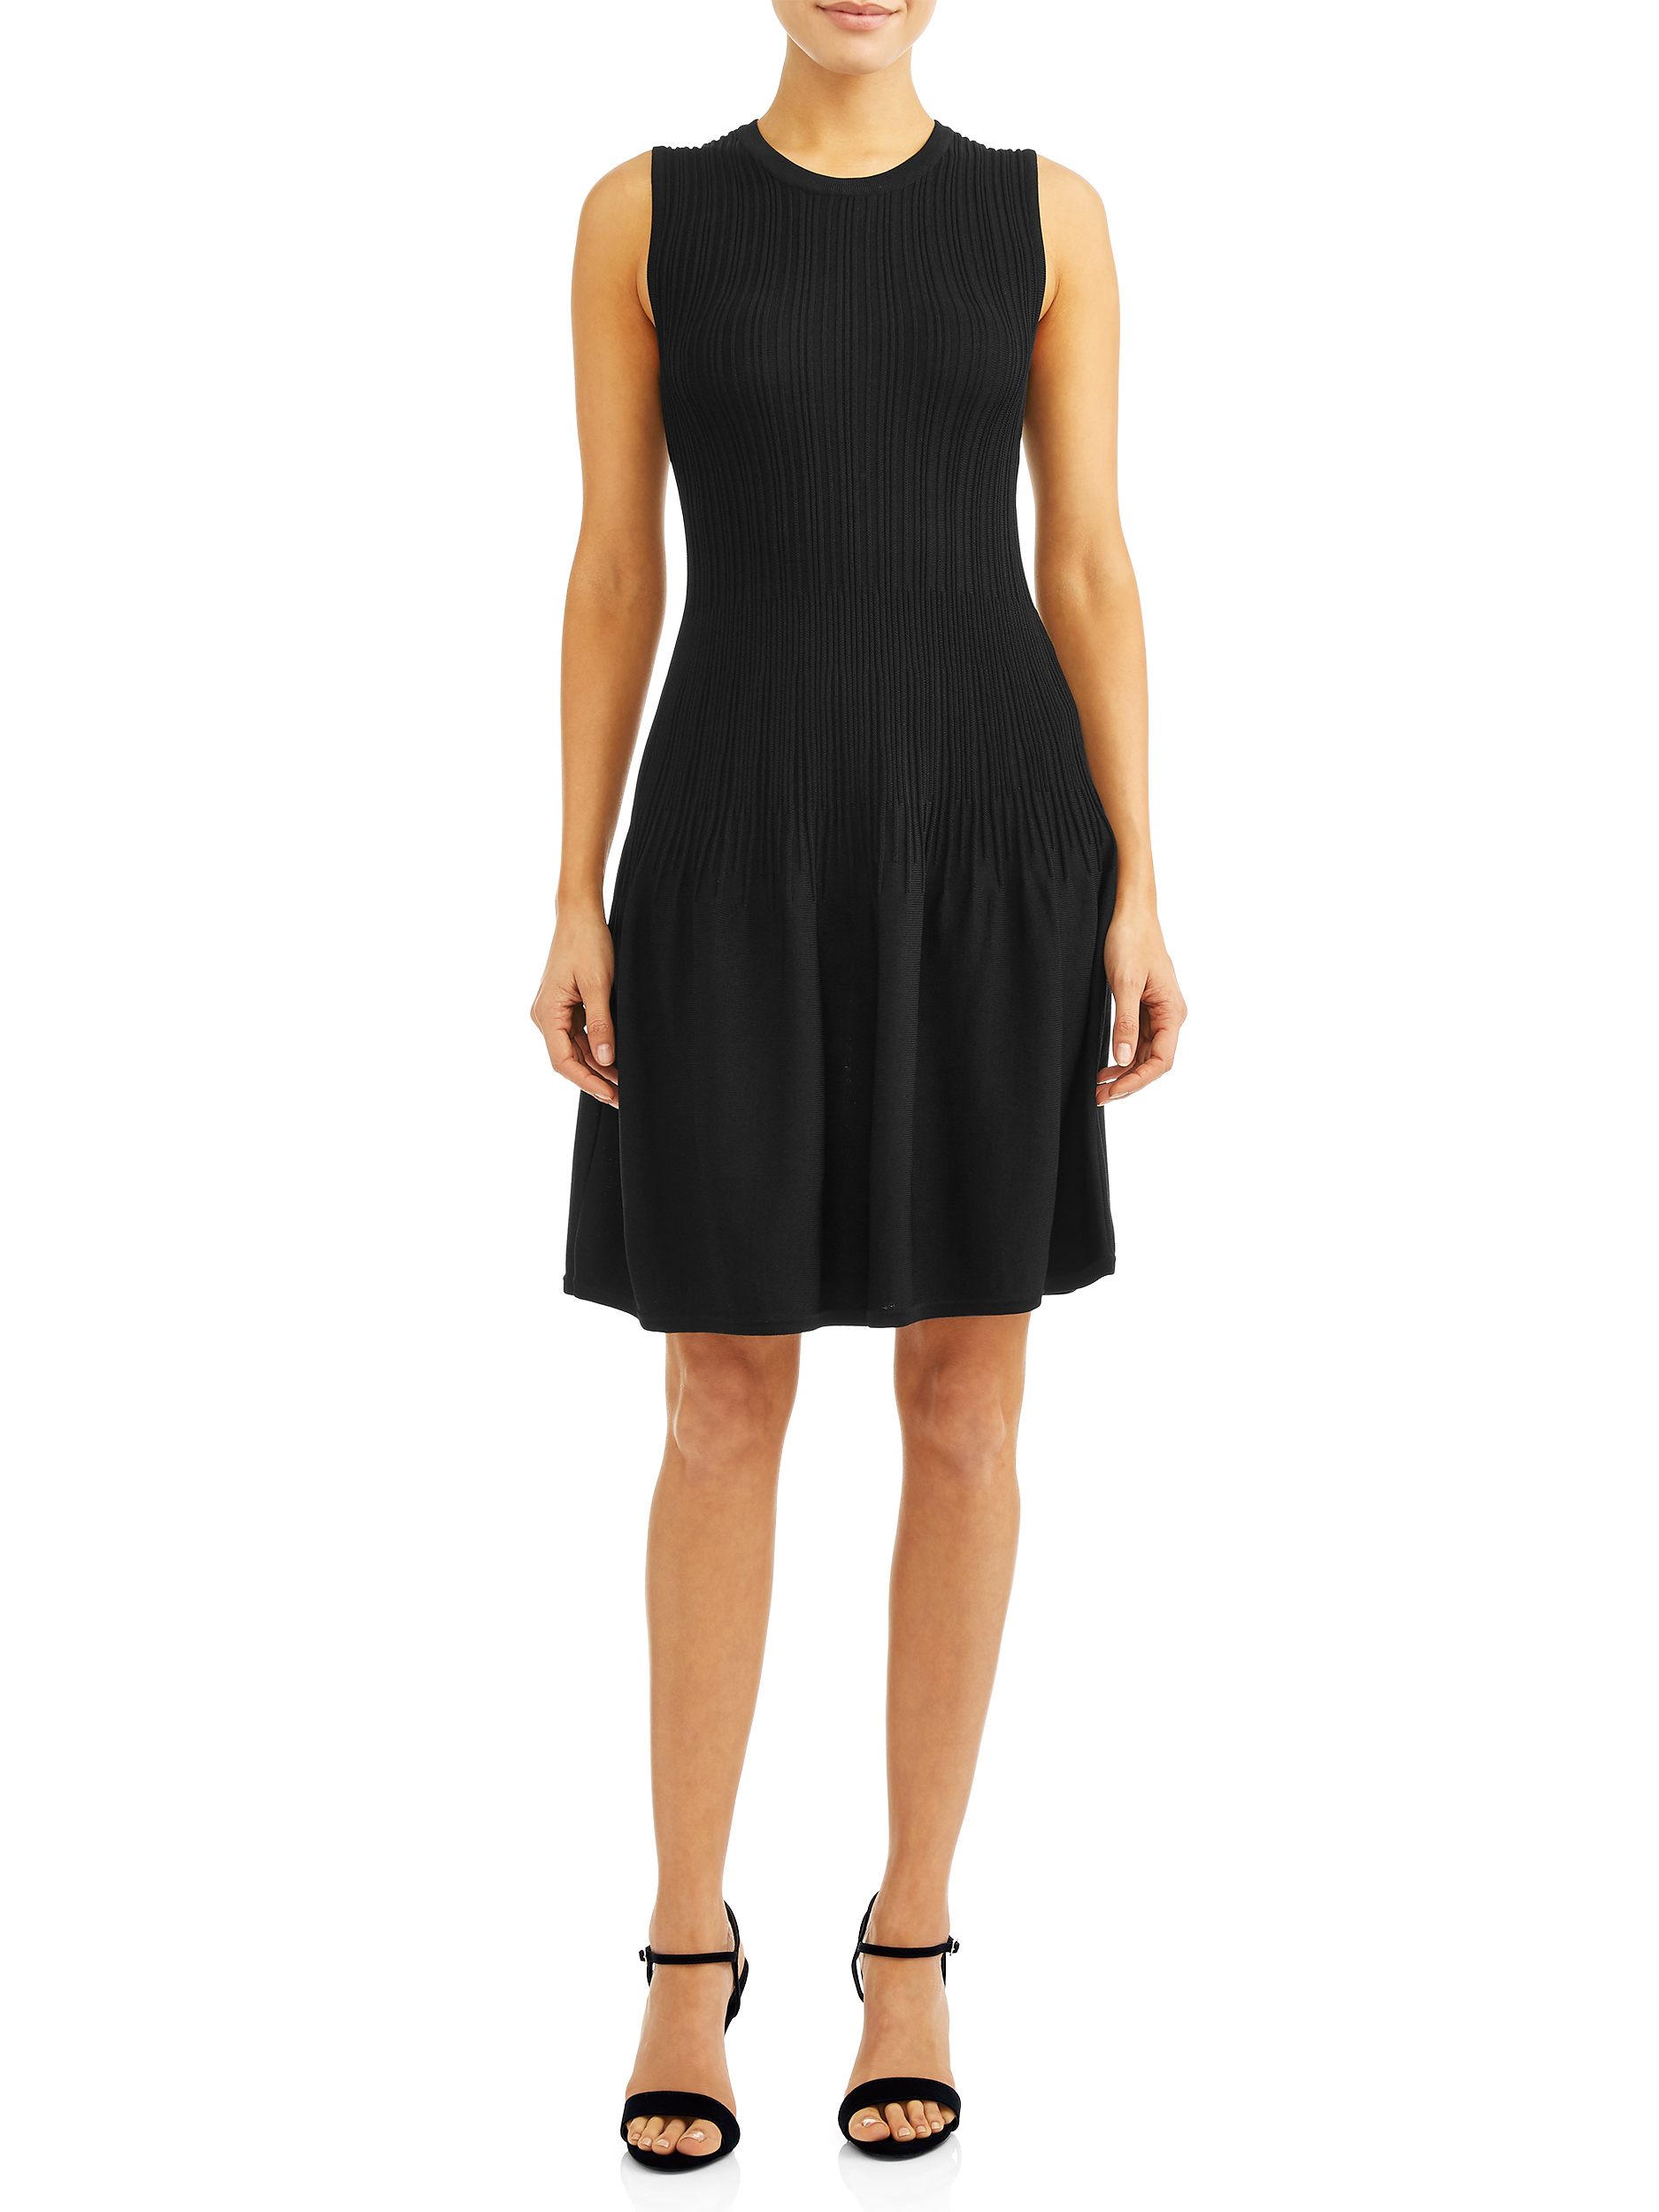 Women's Carly Sleeveless Dress